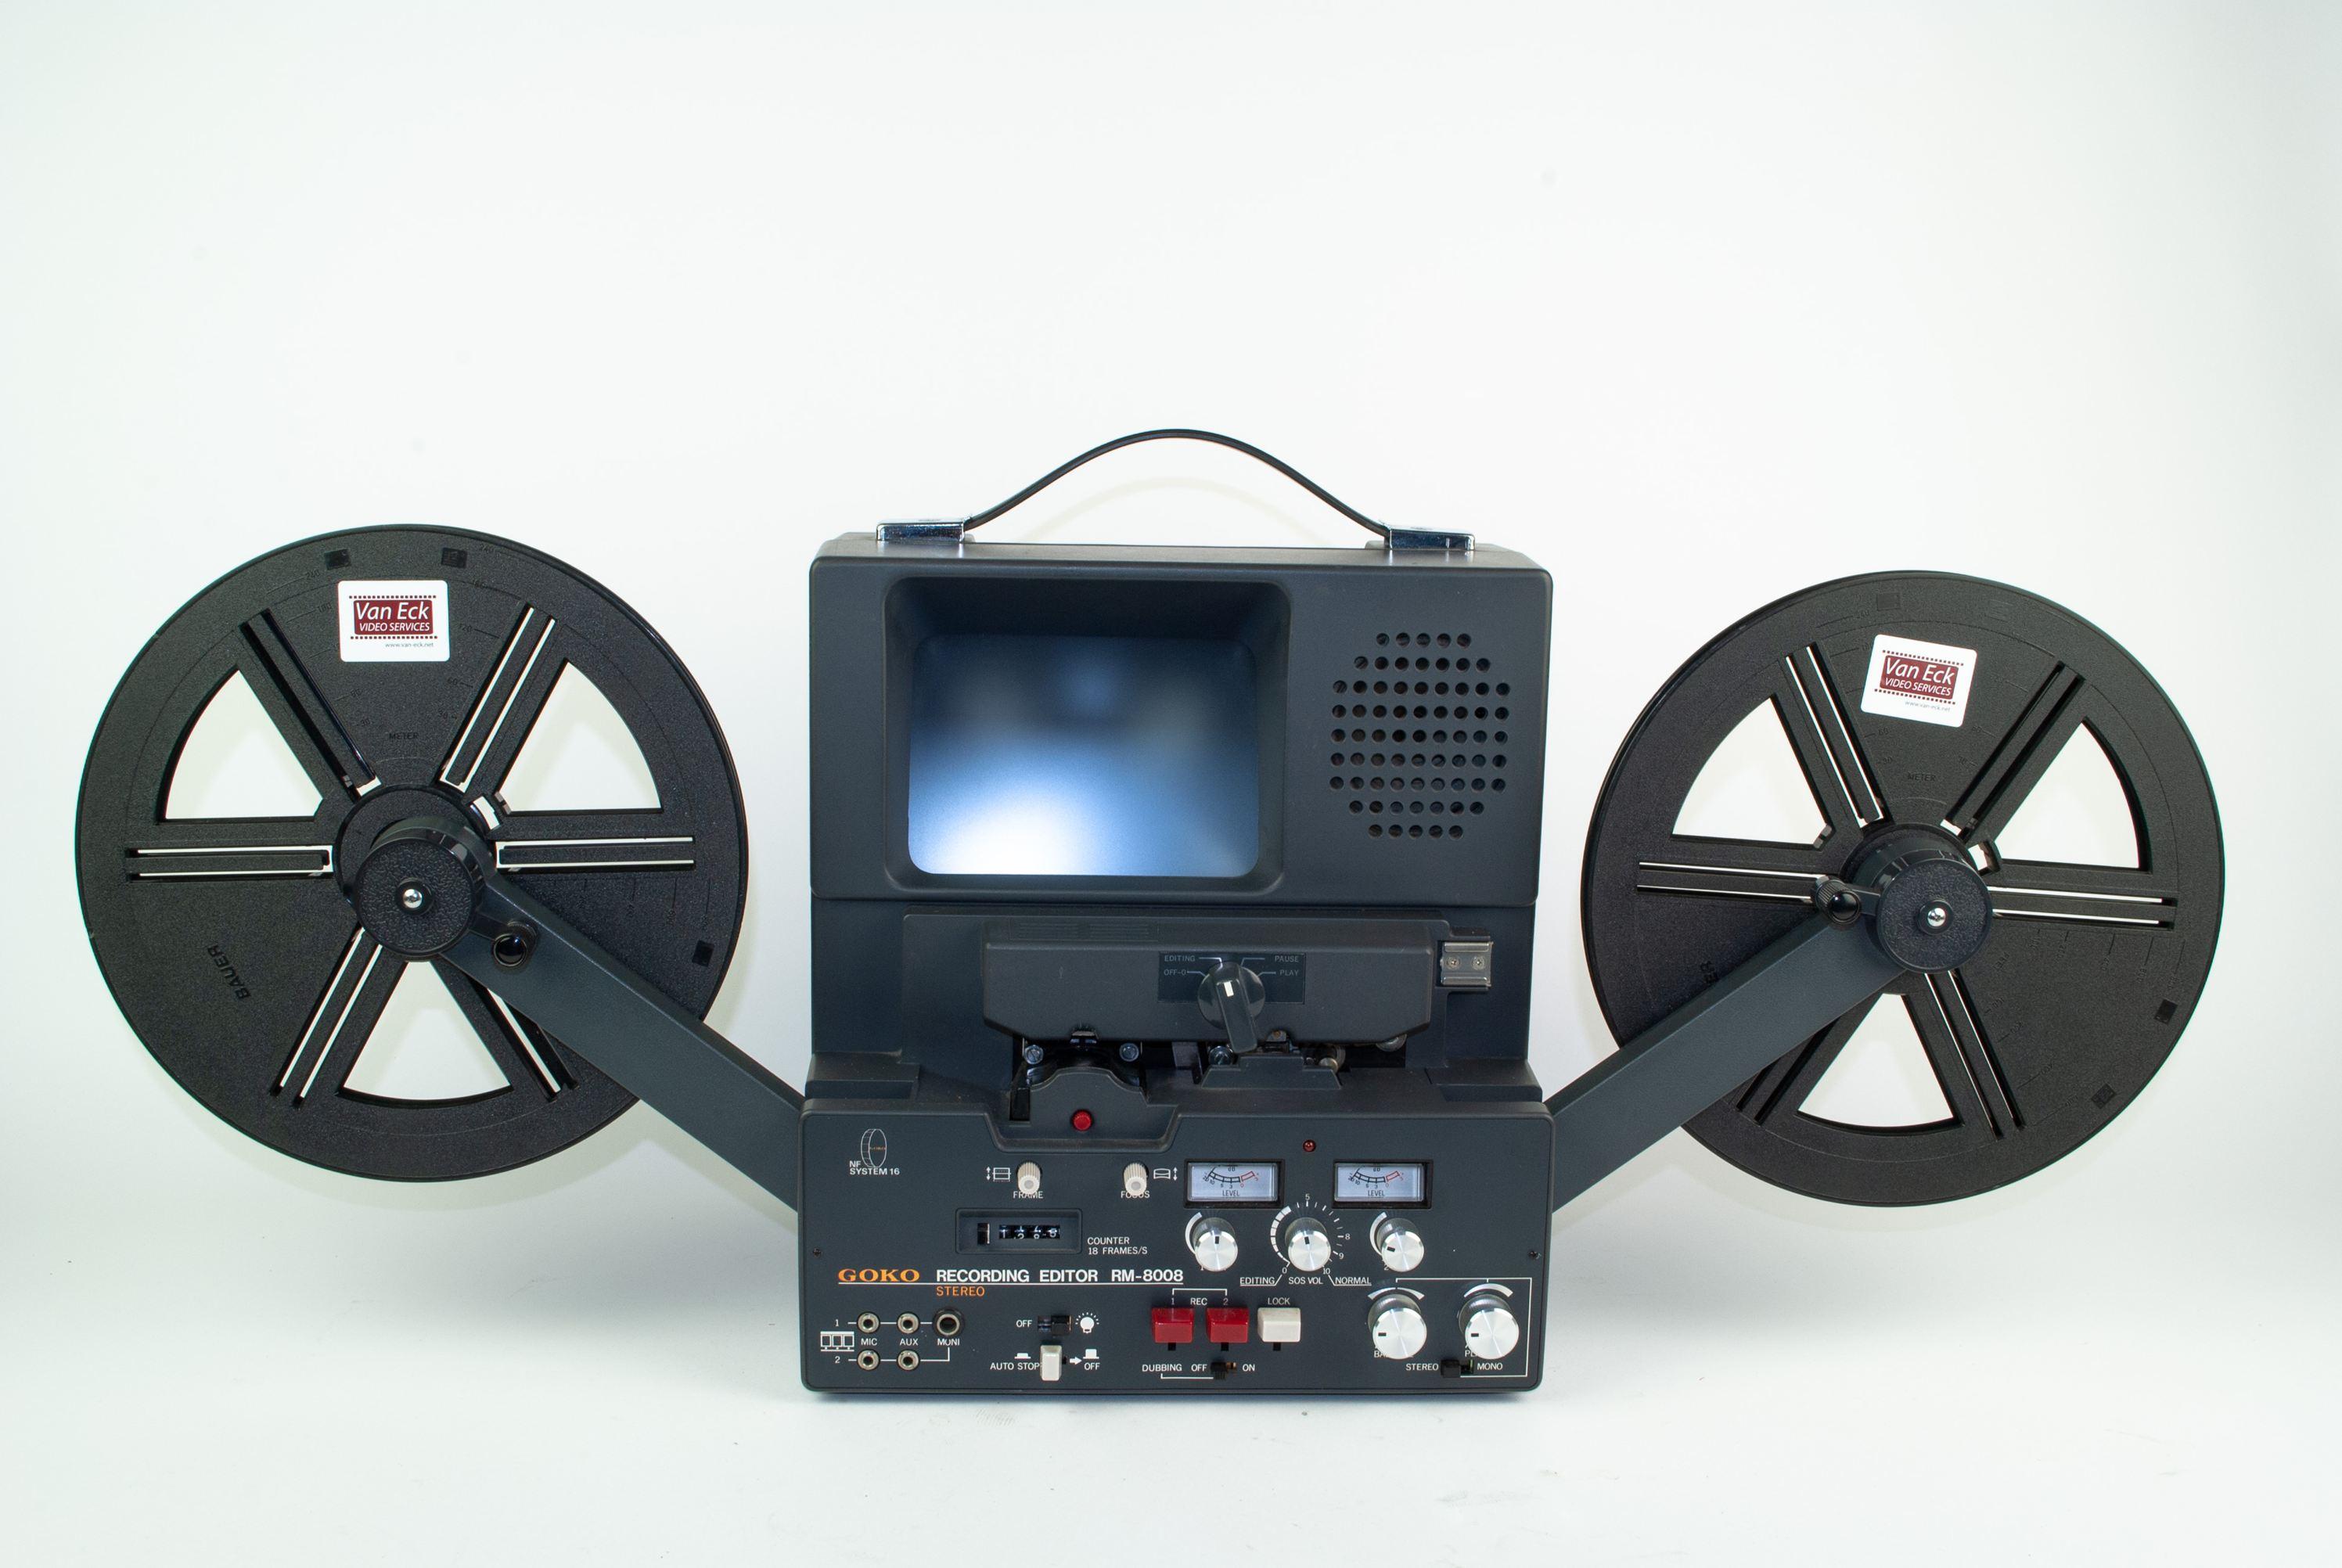 RM-8008